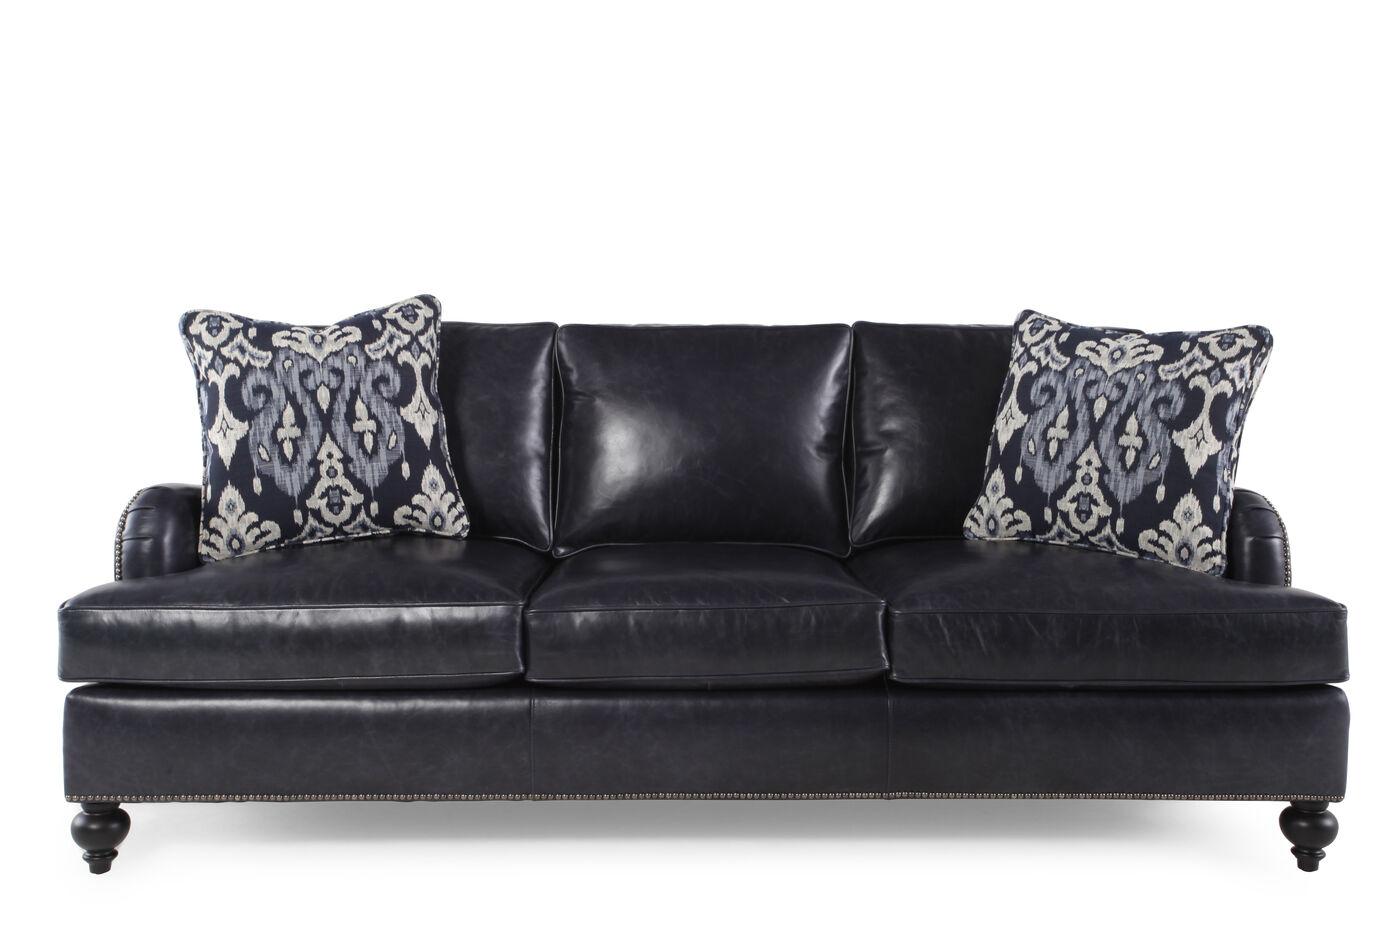 Bernhardt Beckford Leather Sofa